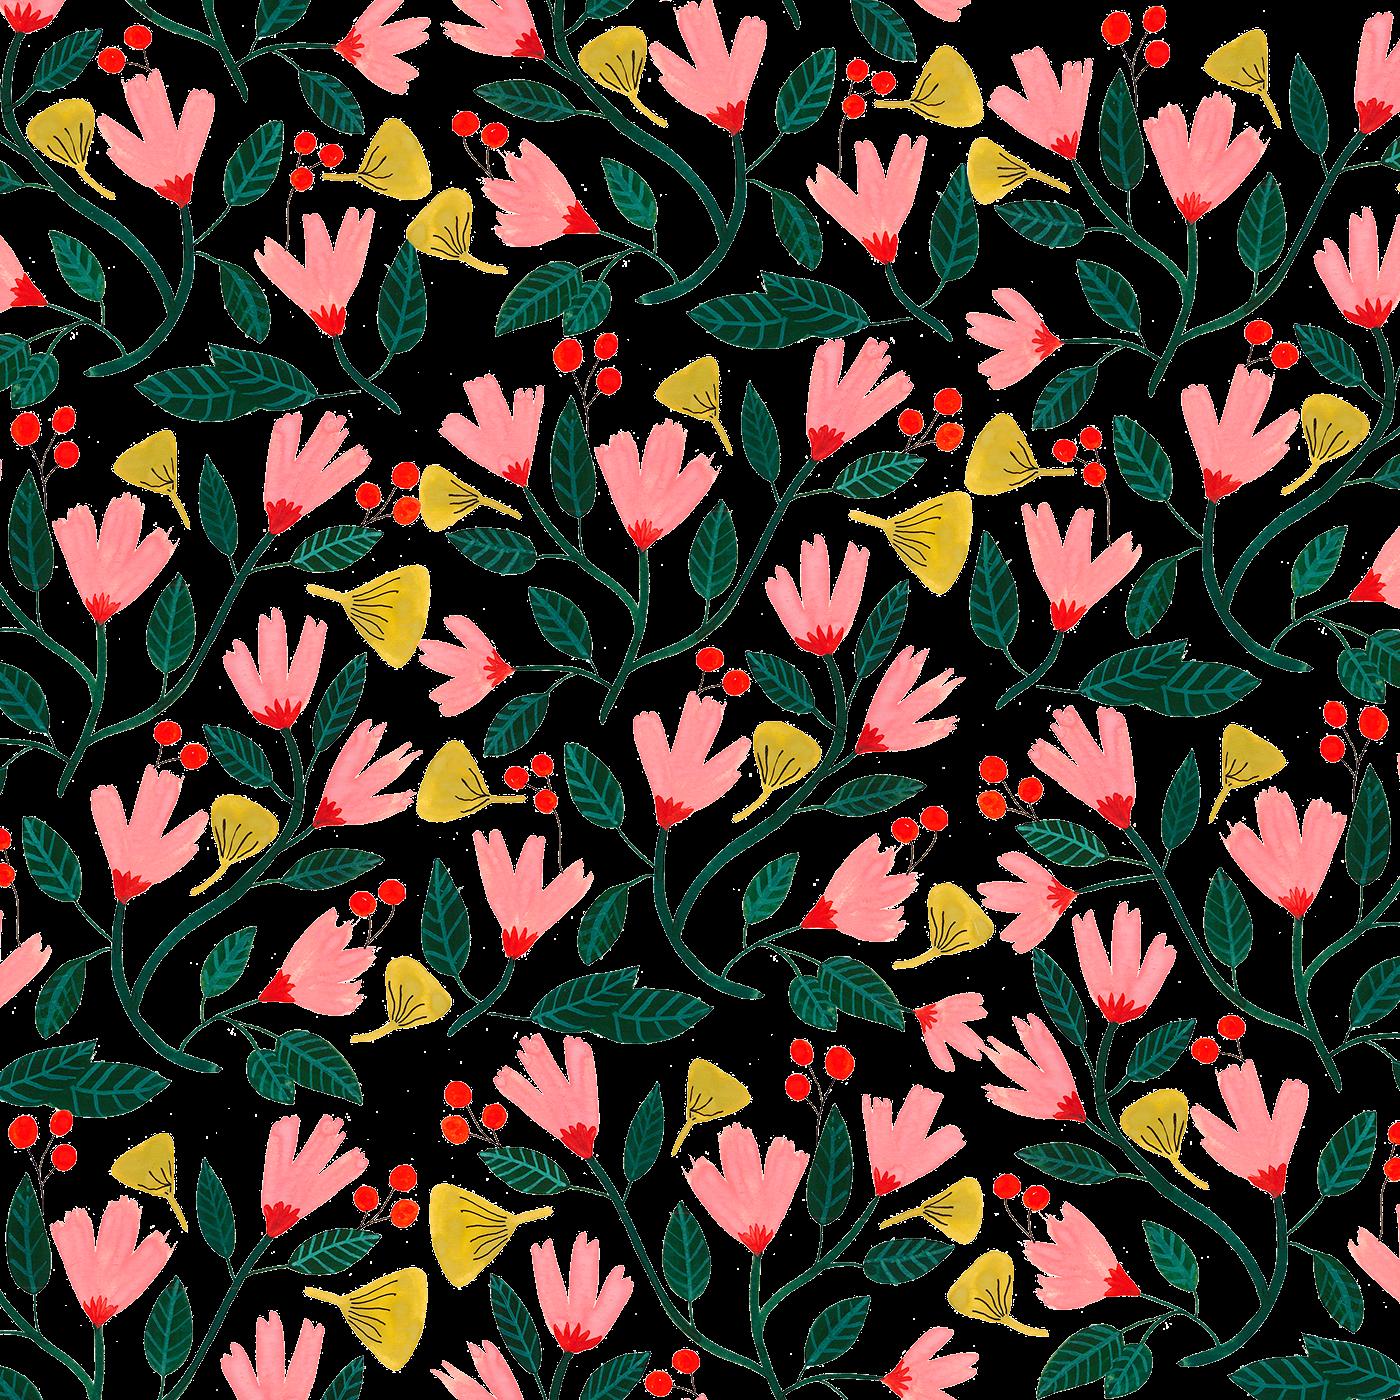 floral pattern on behance